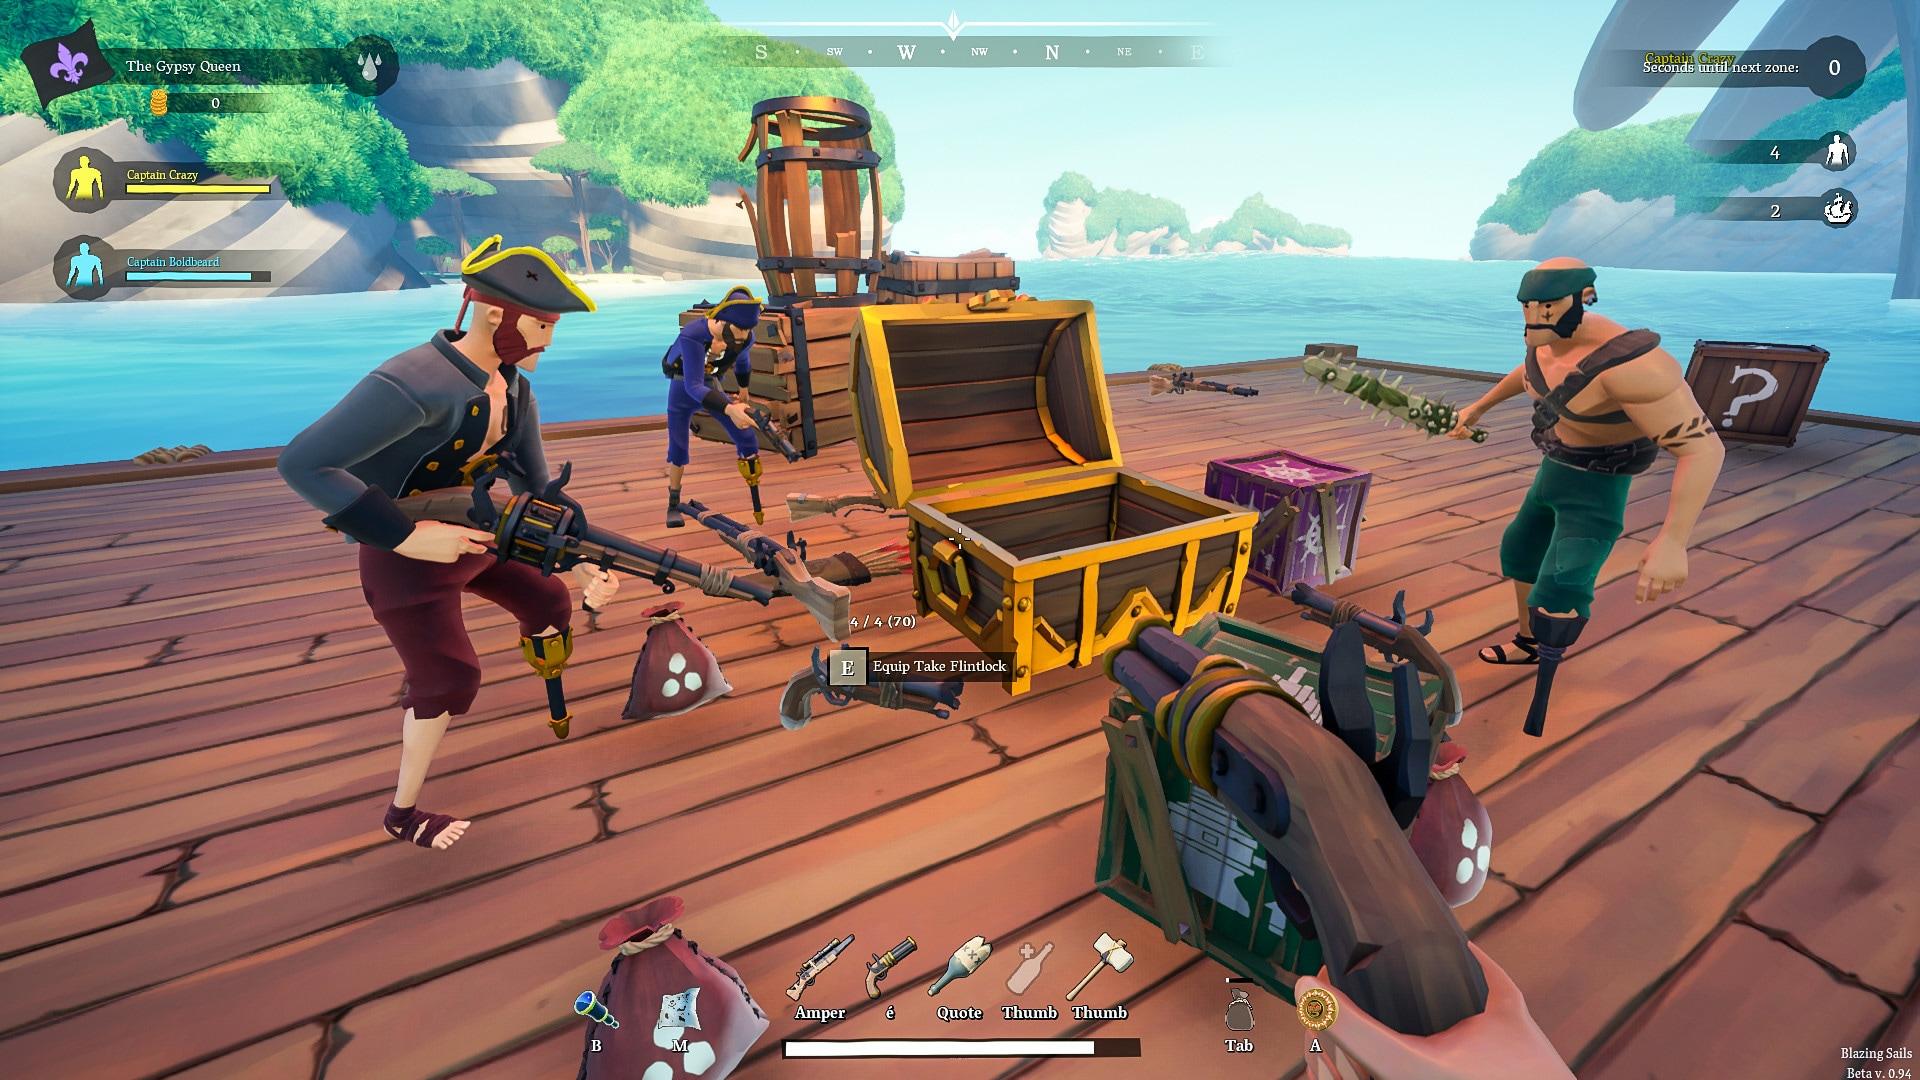 Blazing Sails: Pirate Battle Royale (PC) - Steam Key - RU/CIS - 3